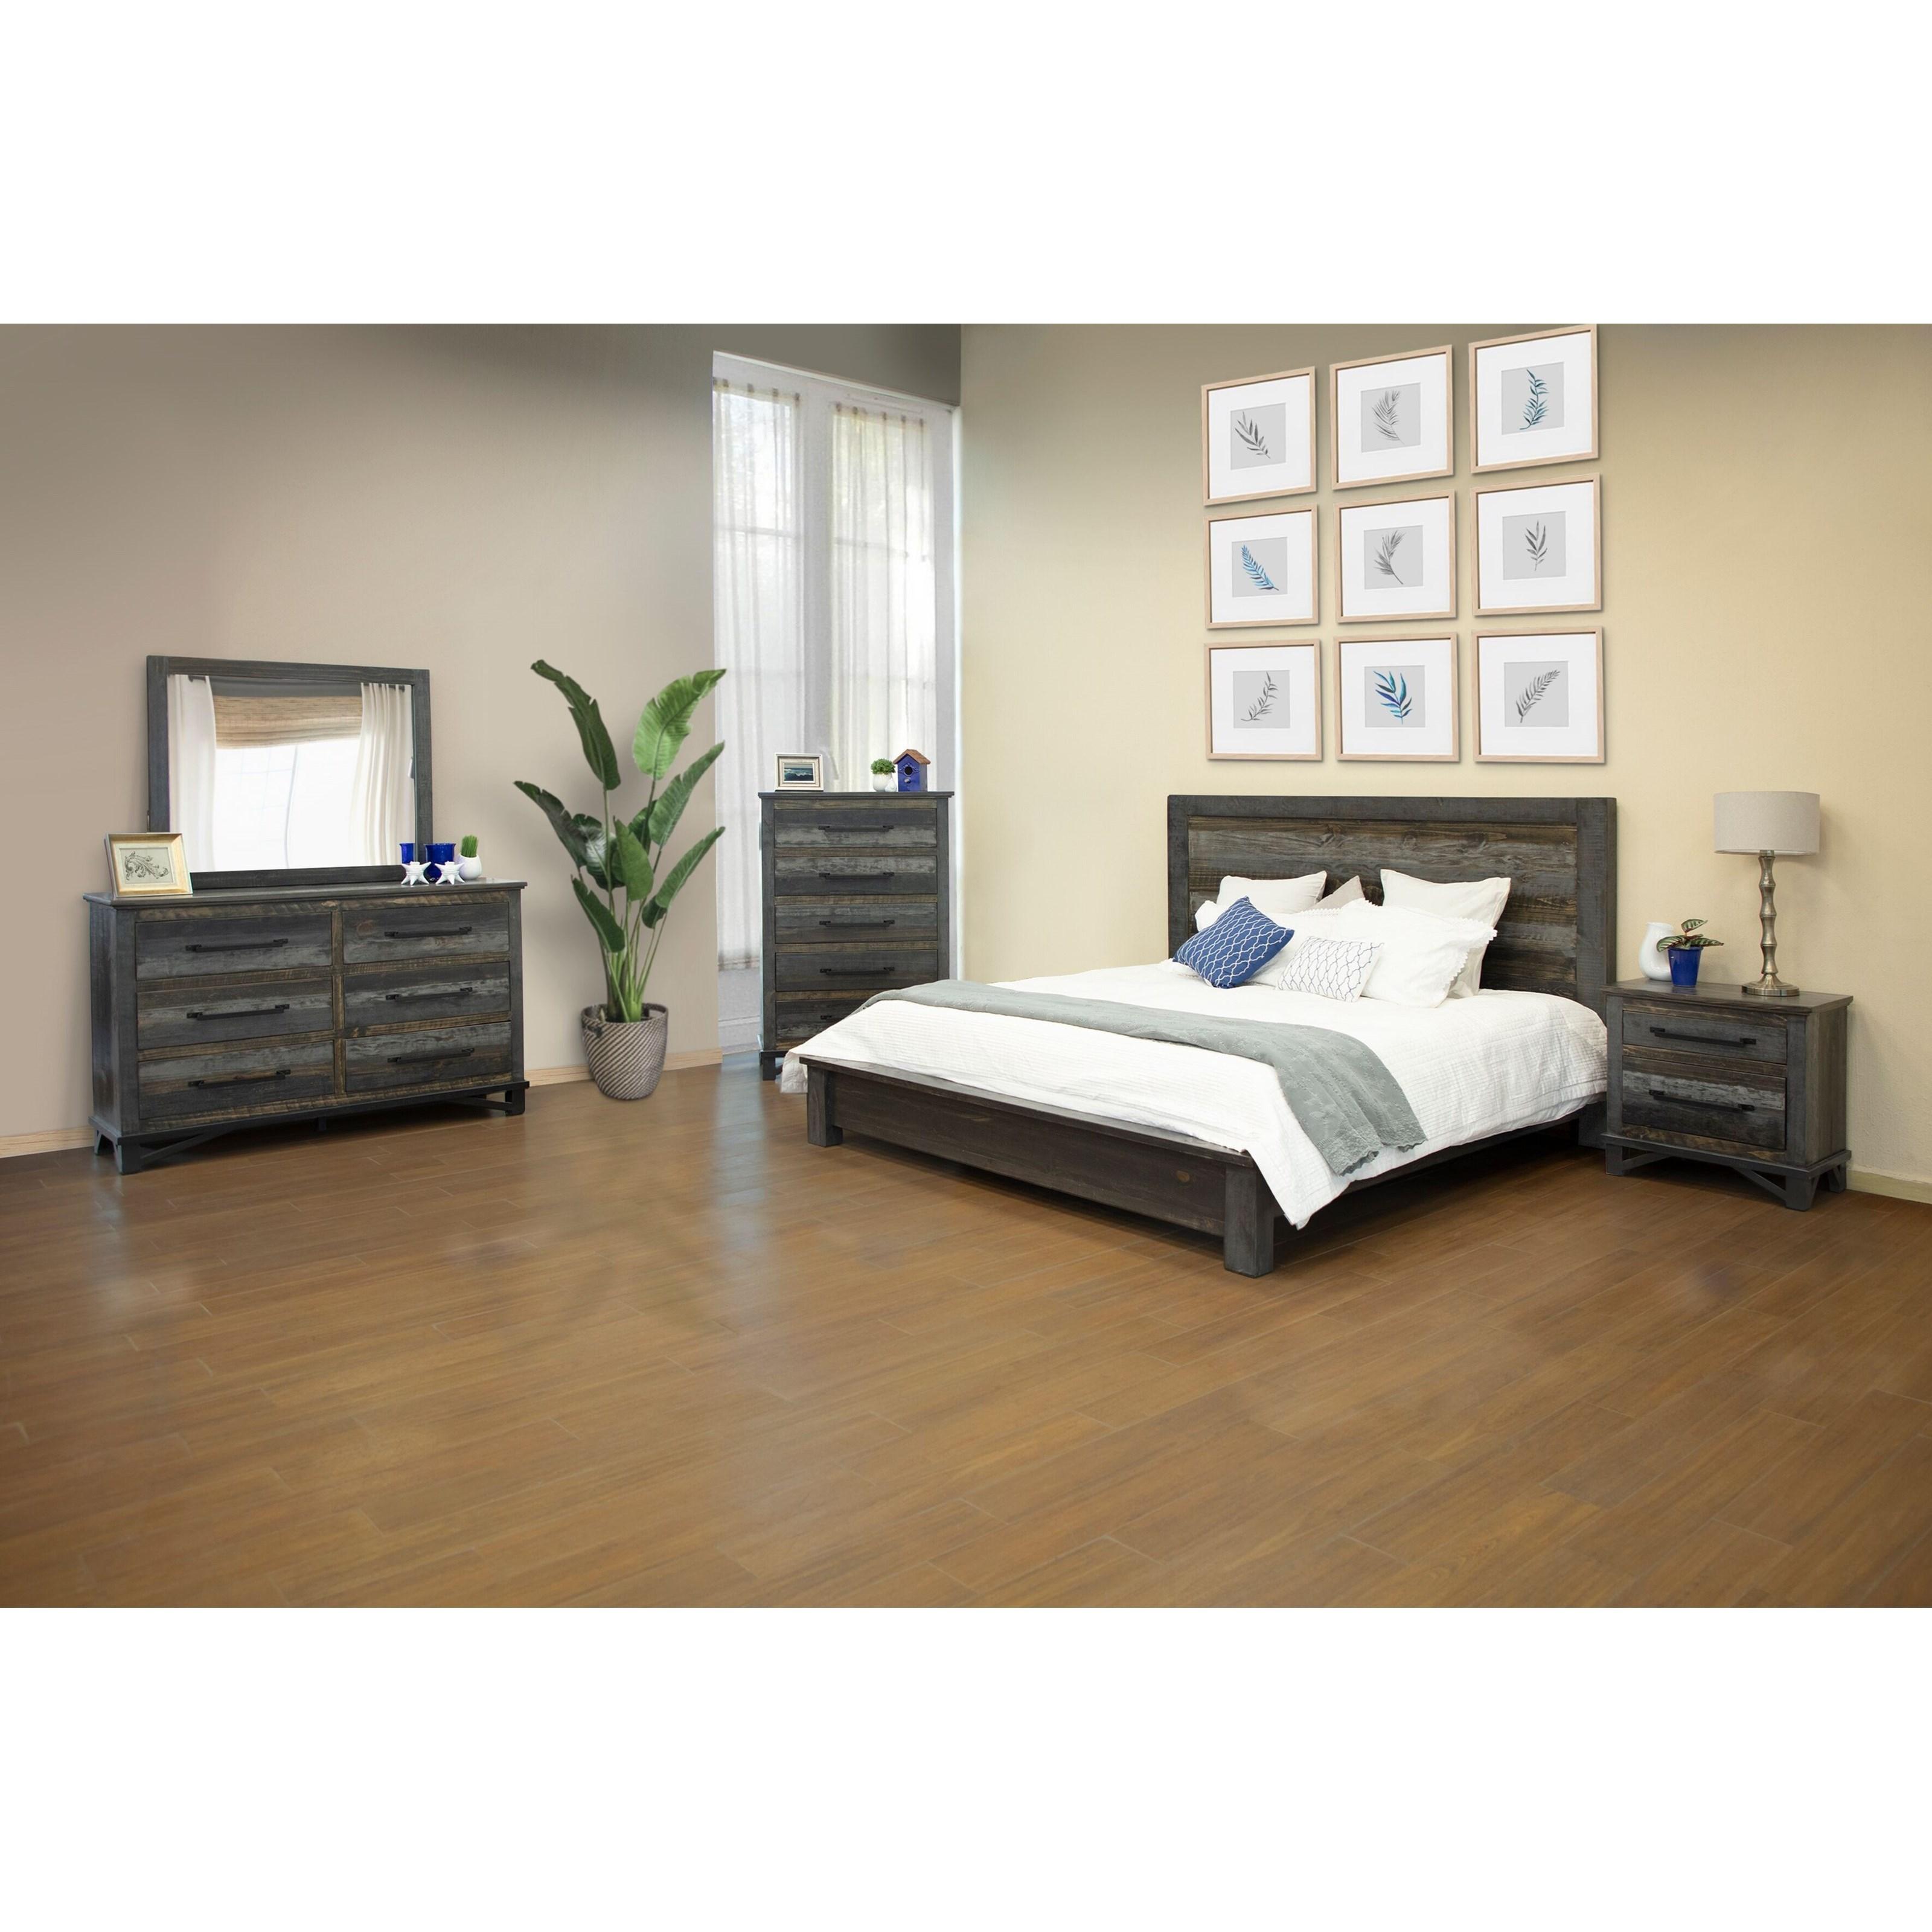 Loft California King Bedroom Group by International Furniture Direct at Houston's Yuma Furniture